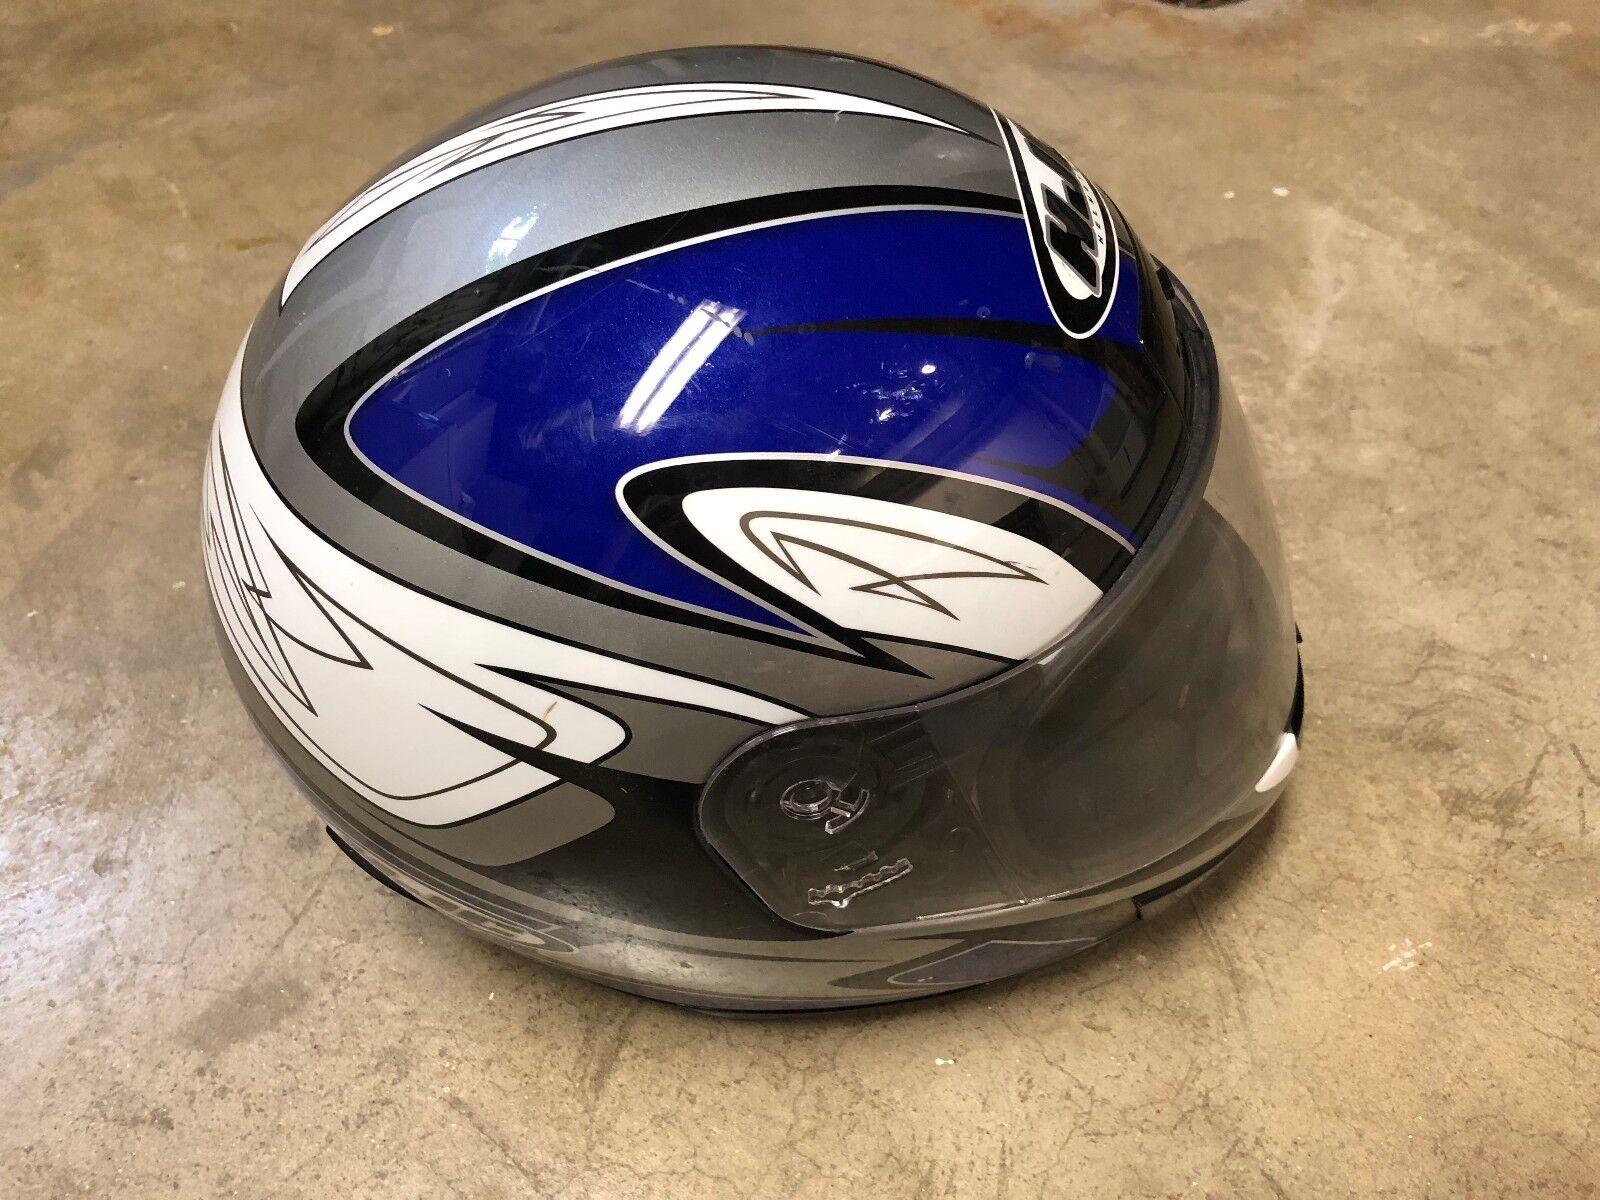 XL - HJC CS-12 Von Breaker Motorcycle Full Face HELMET Blue (7-5/8 to 7-3/4) 62